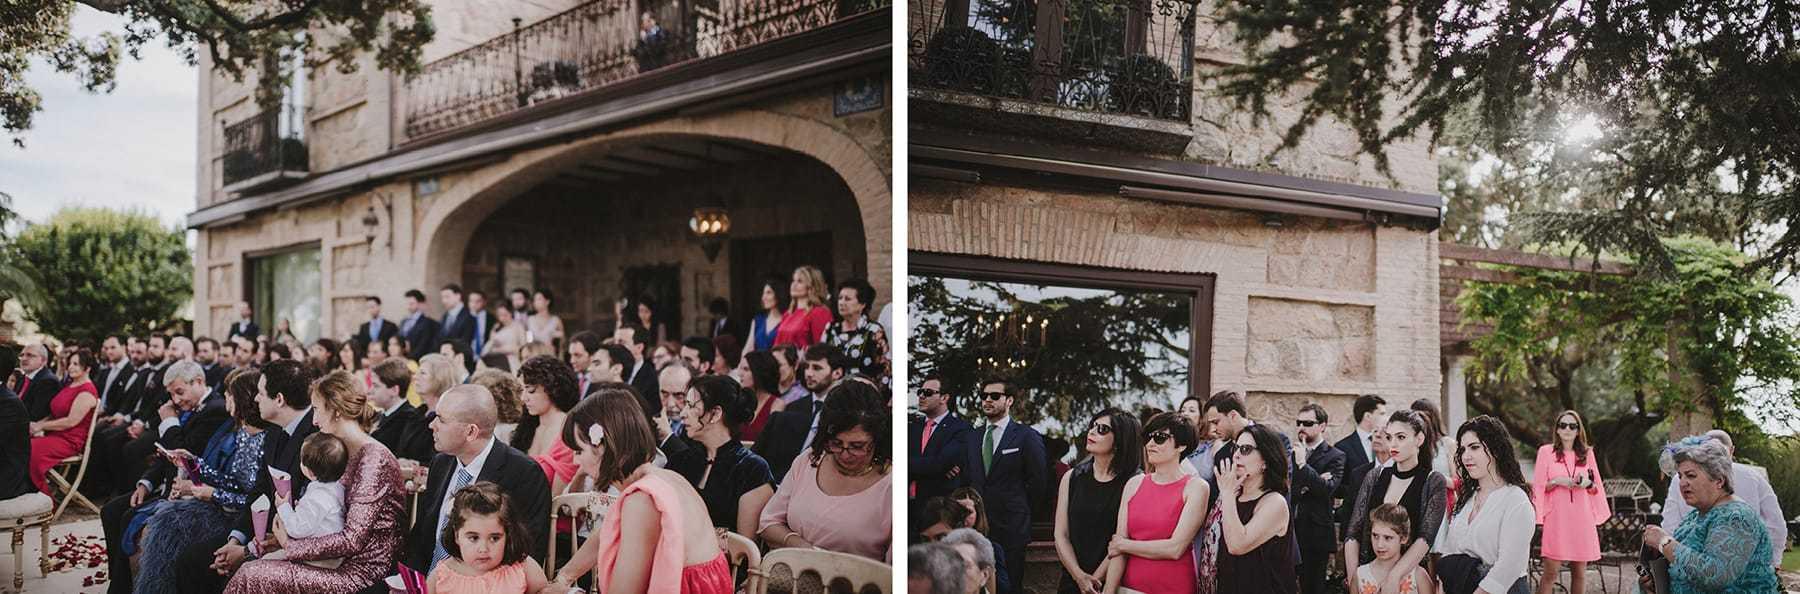 finca_cigarral_de_las_mercedes_hilario_sanchez_fotografo_boda_toledo_071